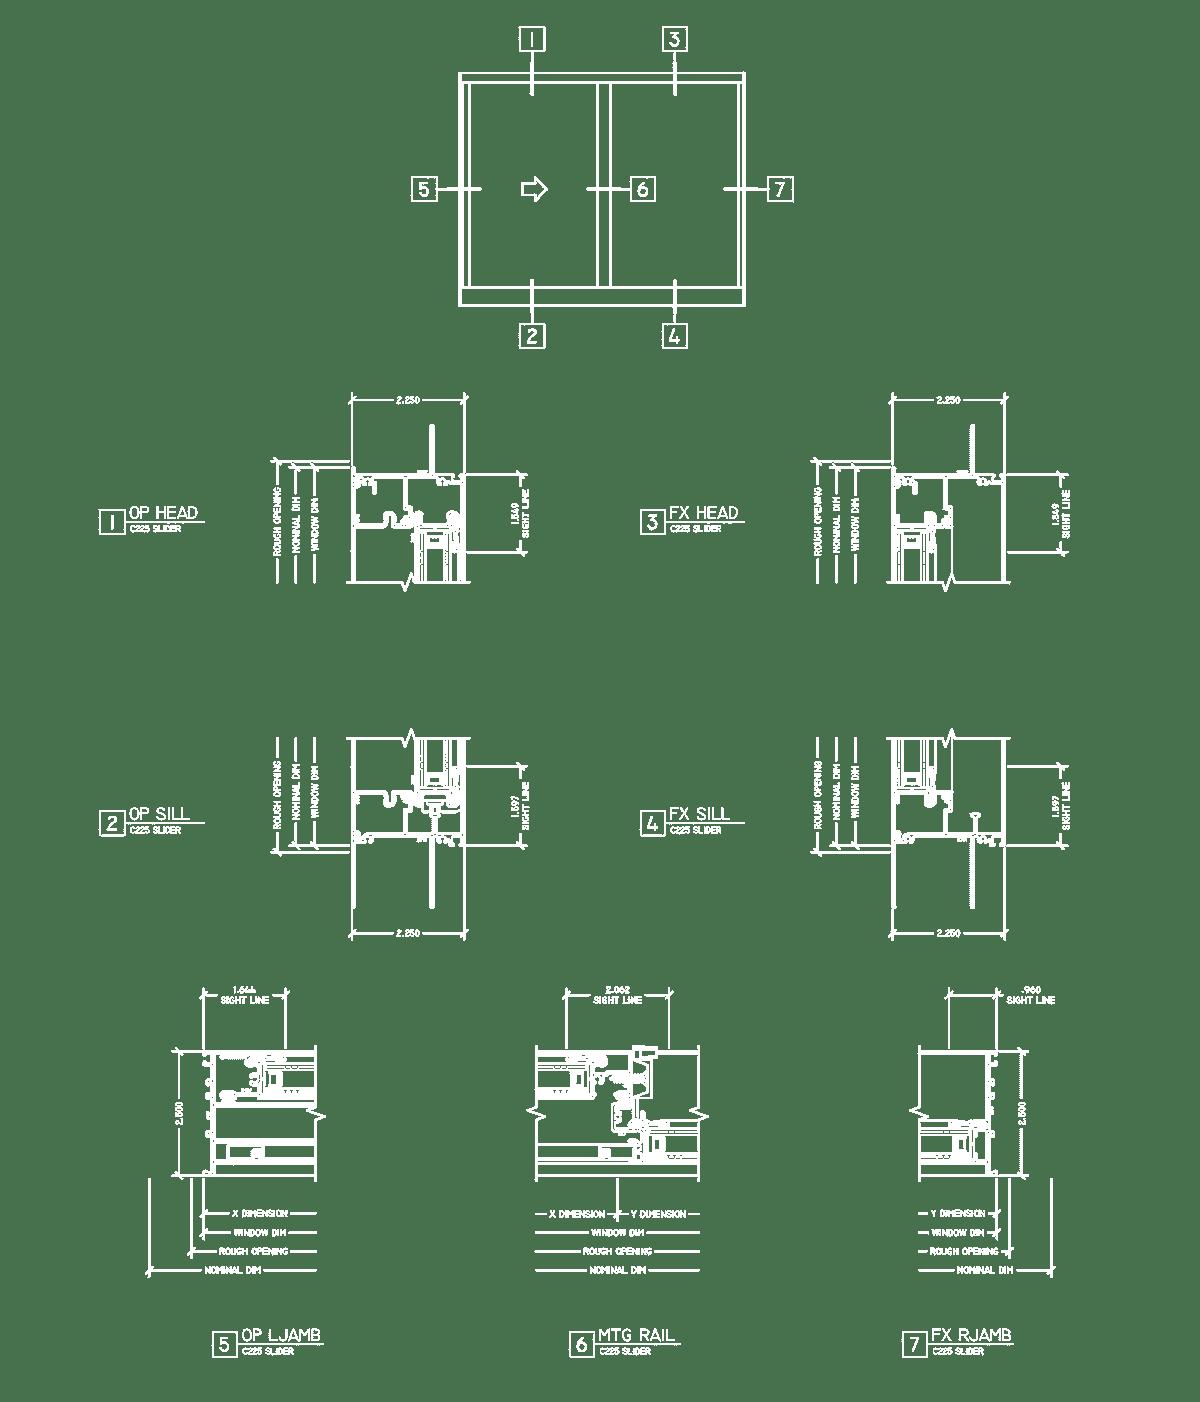 C225 Drawing